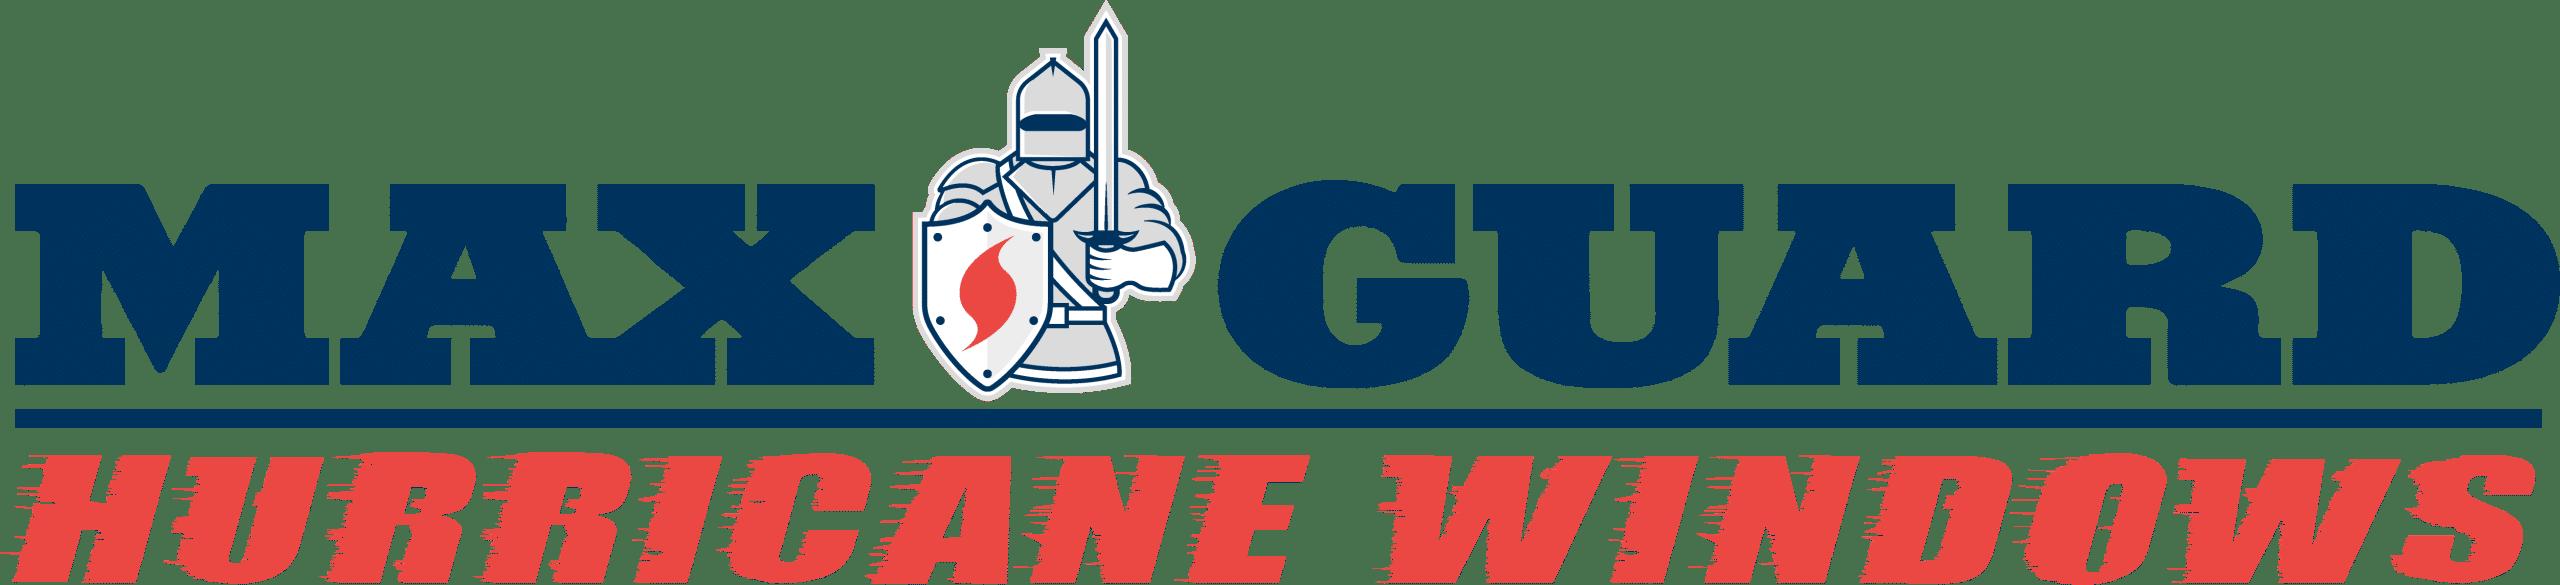 Max Guard Hurricane Windows